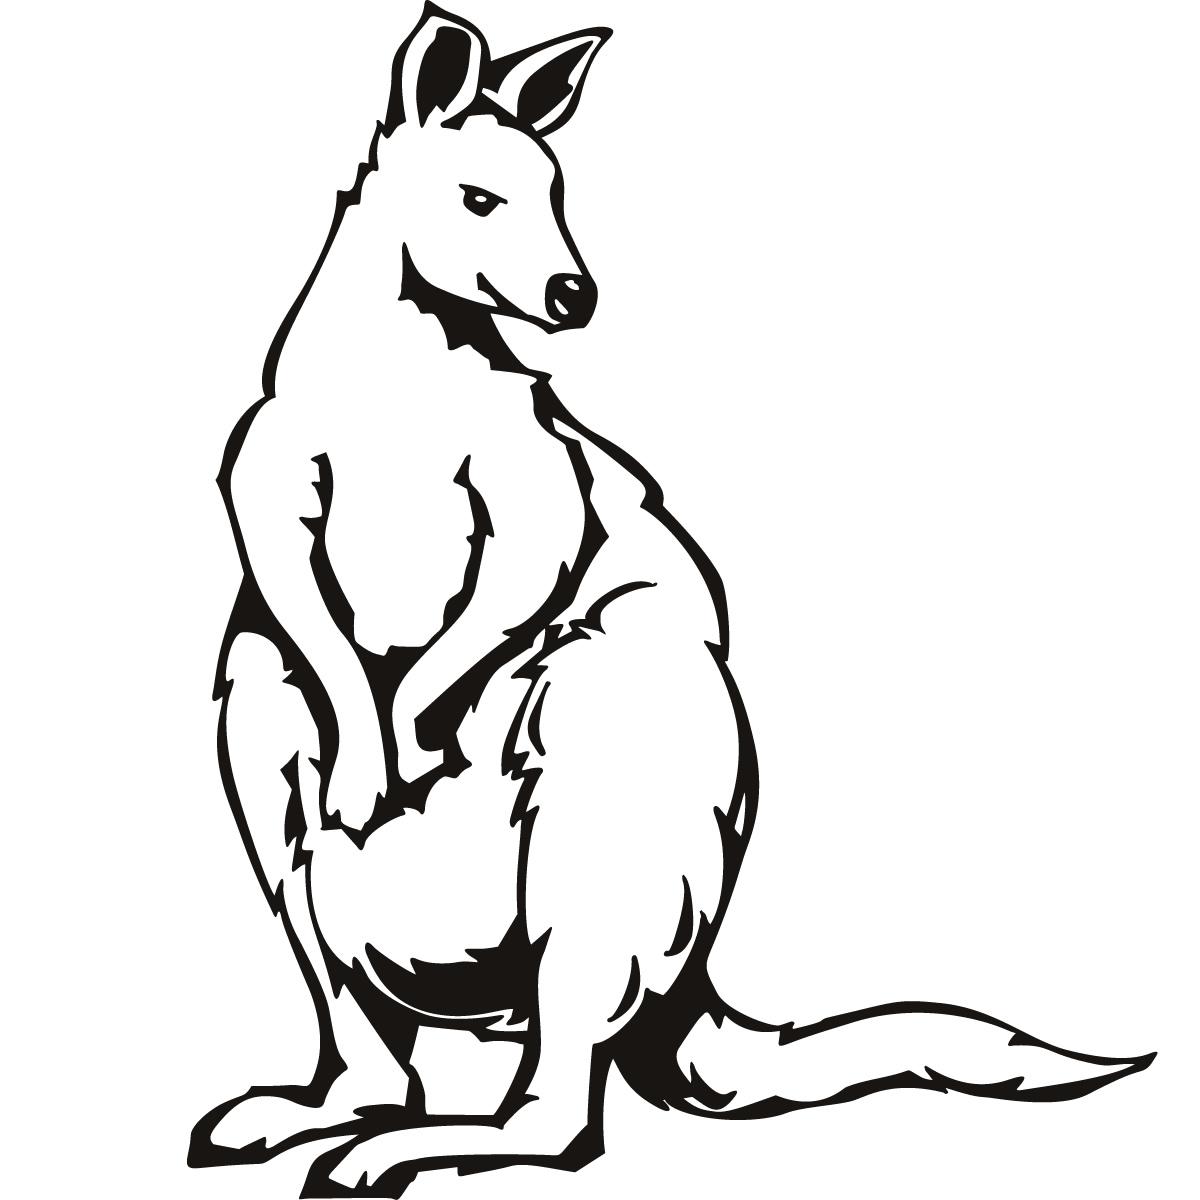 1200x1200 Kangaroo Outline Clipart